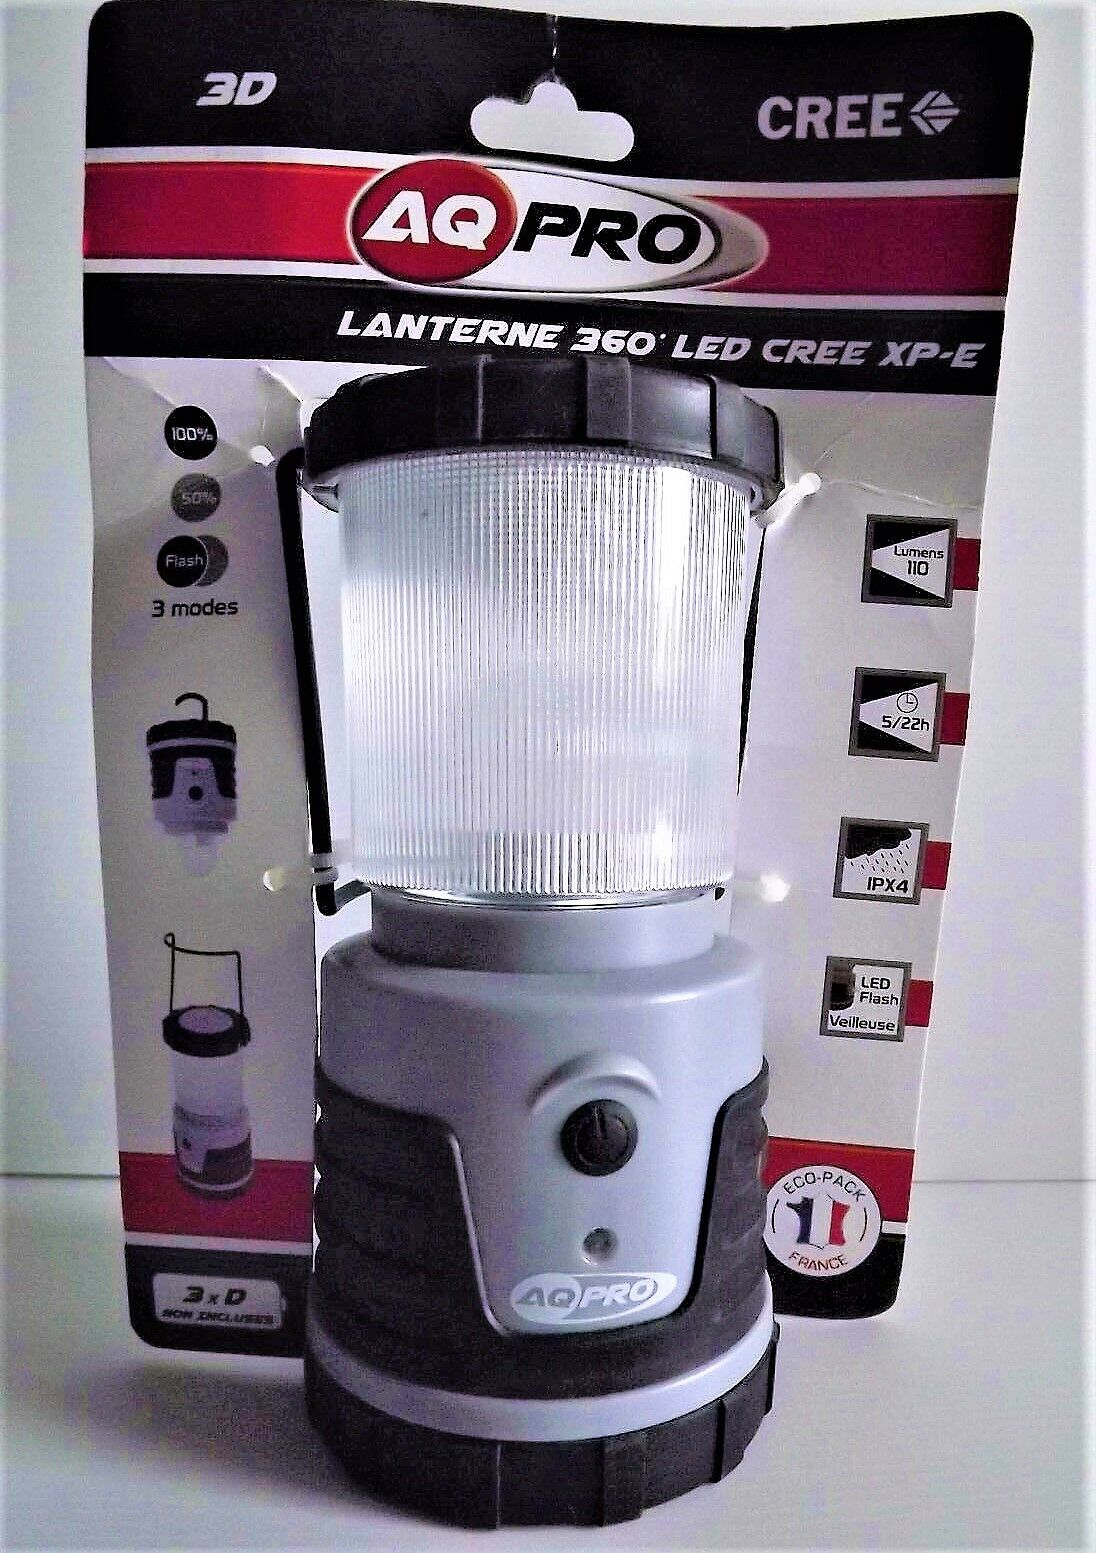 AQ PRO Lantern 360  for camping Work Led 3D Cree XP - E NEW